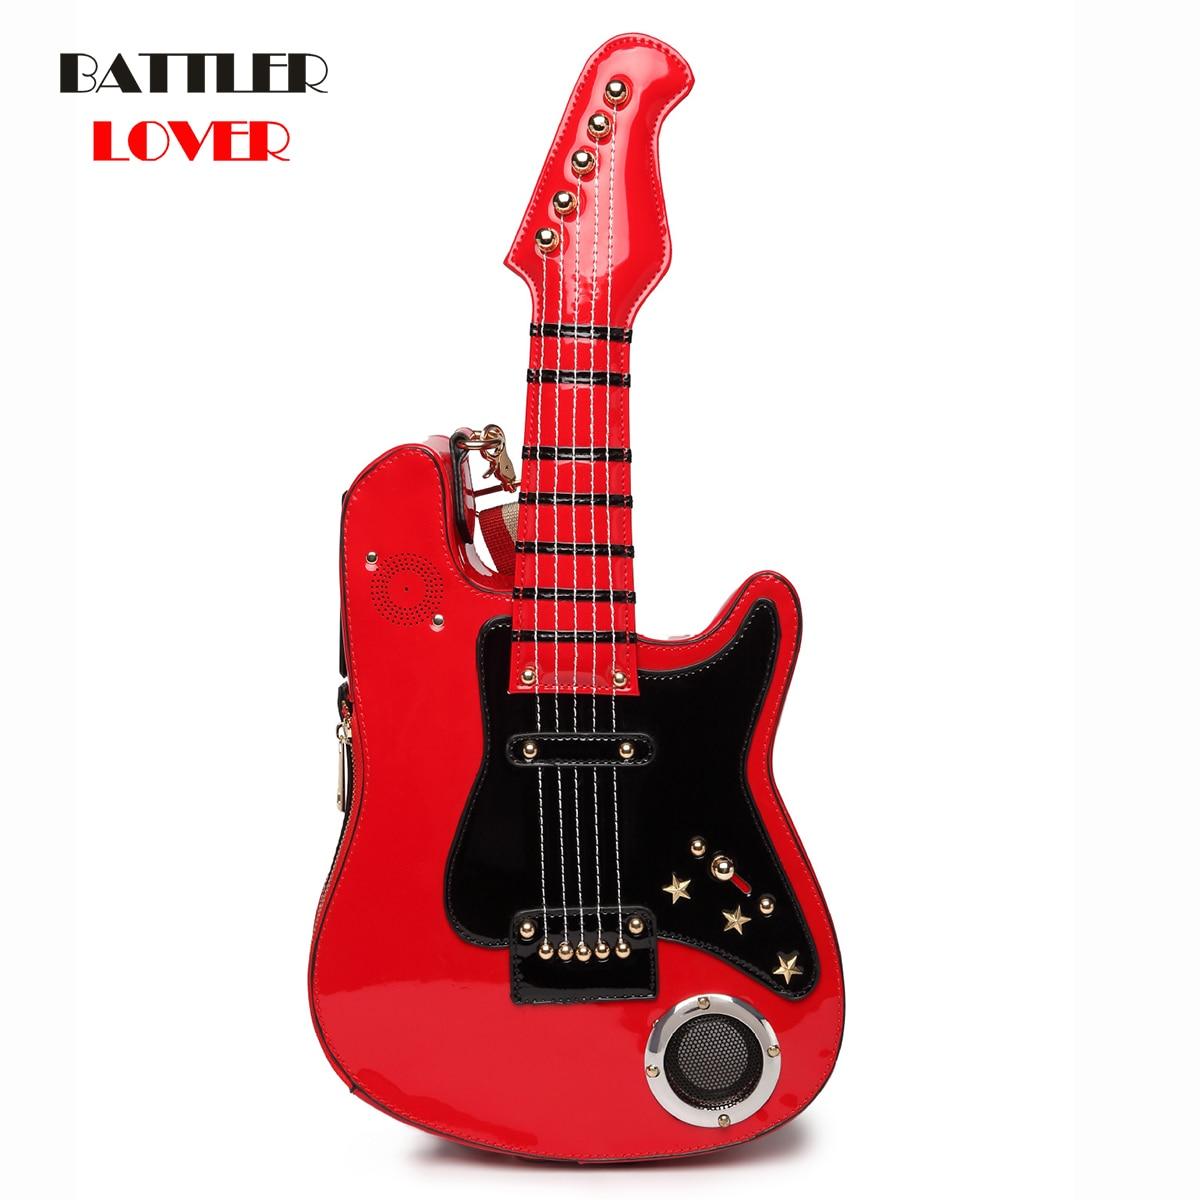 Bolsos de guitarra para mujer 2019, bolsos para mujer, bolso de mano 5AA con batería USB SD, bandolera de hombro para chicas, bolsos de lujo para mujer, bolso de diseñador